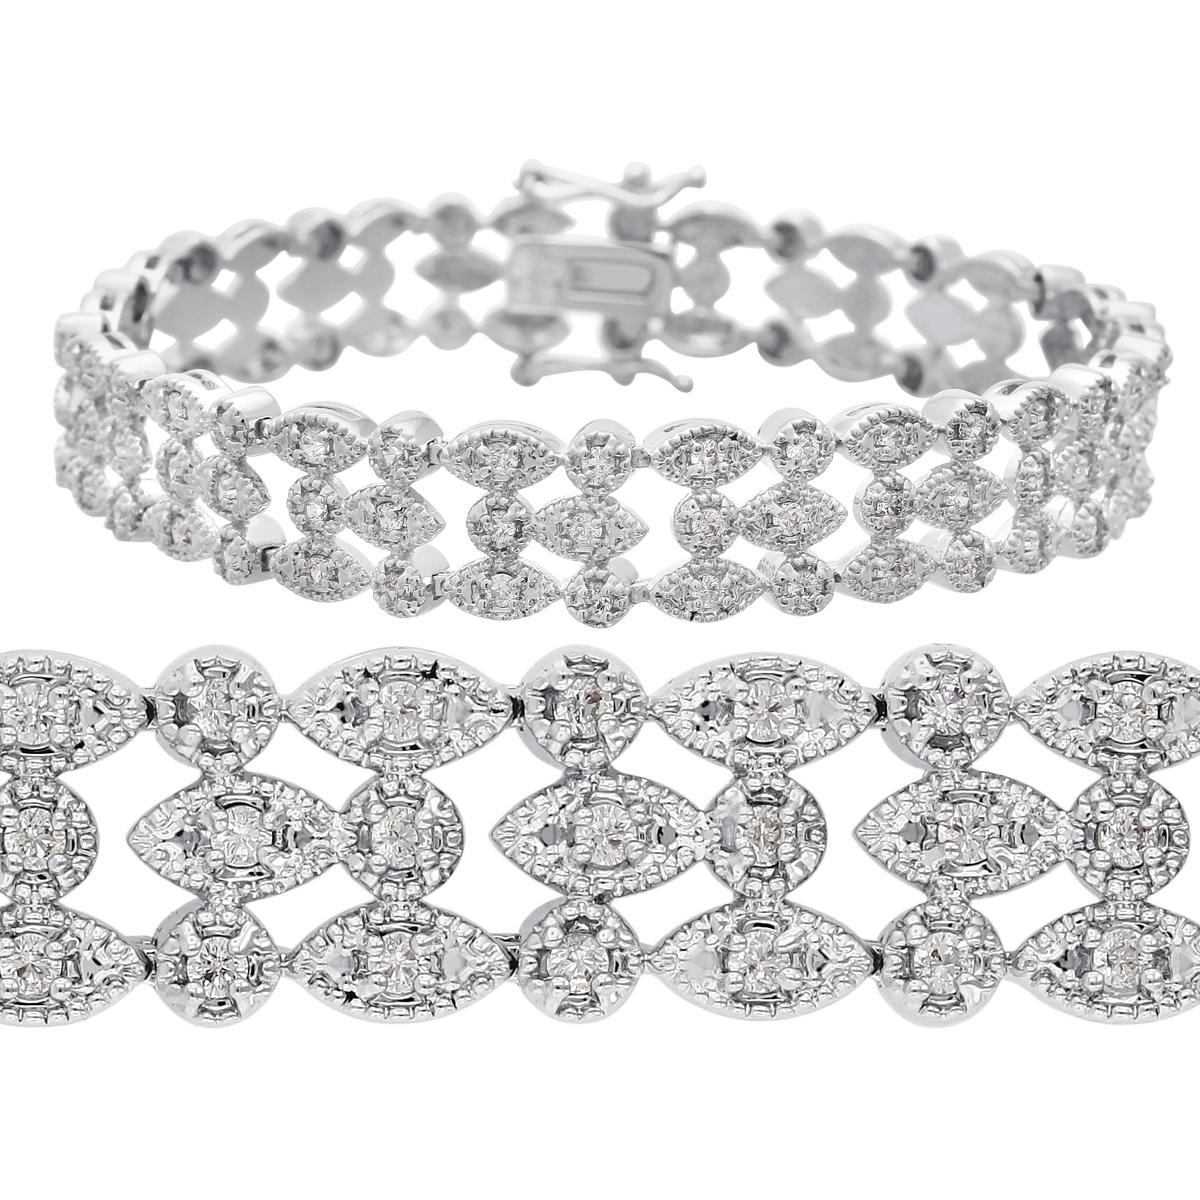 f26be79eb Tennis Bracelet   Diamond Tennis Bracelet   1 Carat Three Row Diamond  Bracelet, Platinum Overlay   Best Jewelry Deals